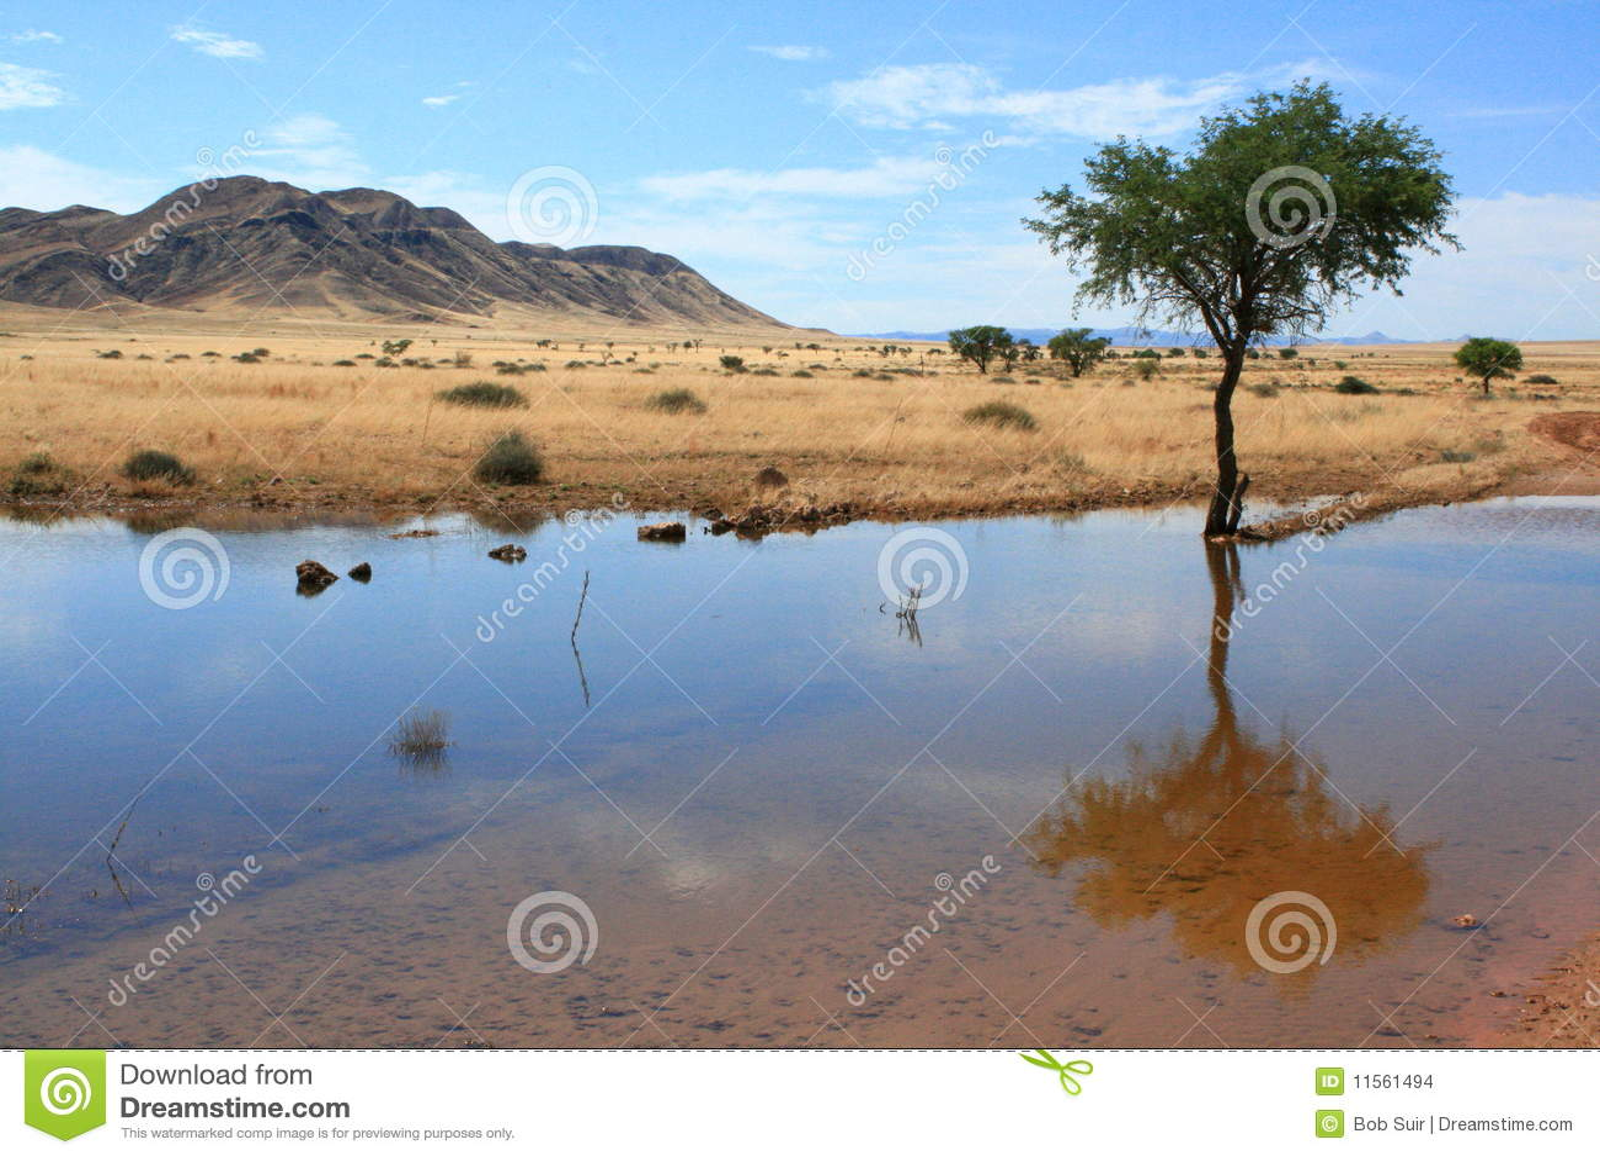 Namibian landscape water